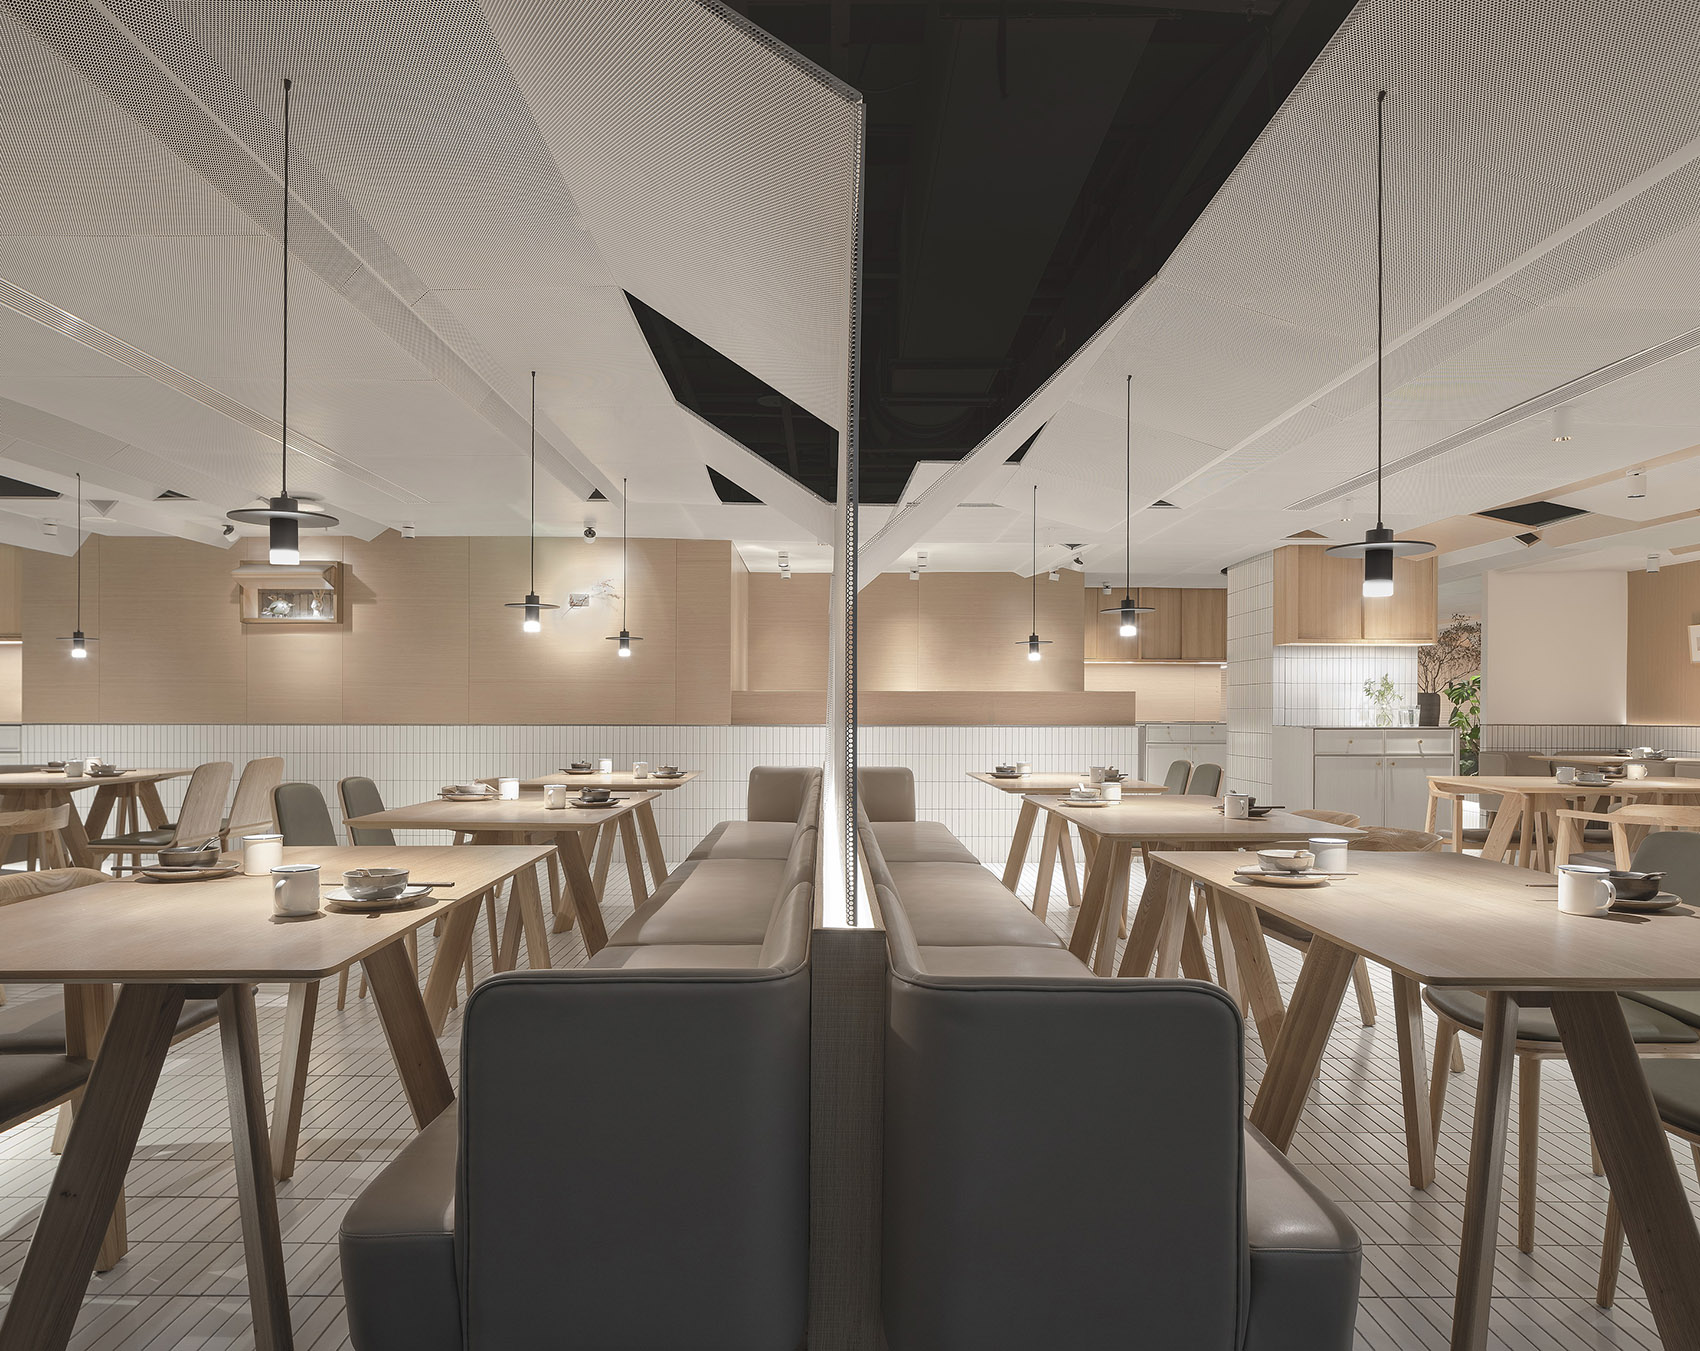 019-goose-hut-home-bistro-china-by-golucci-interior-architects.jpg